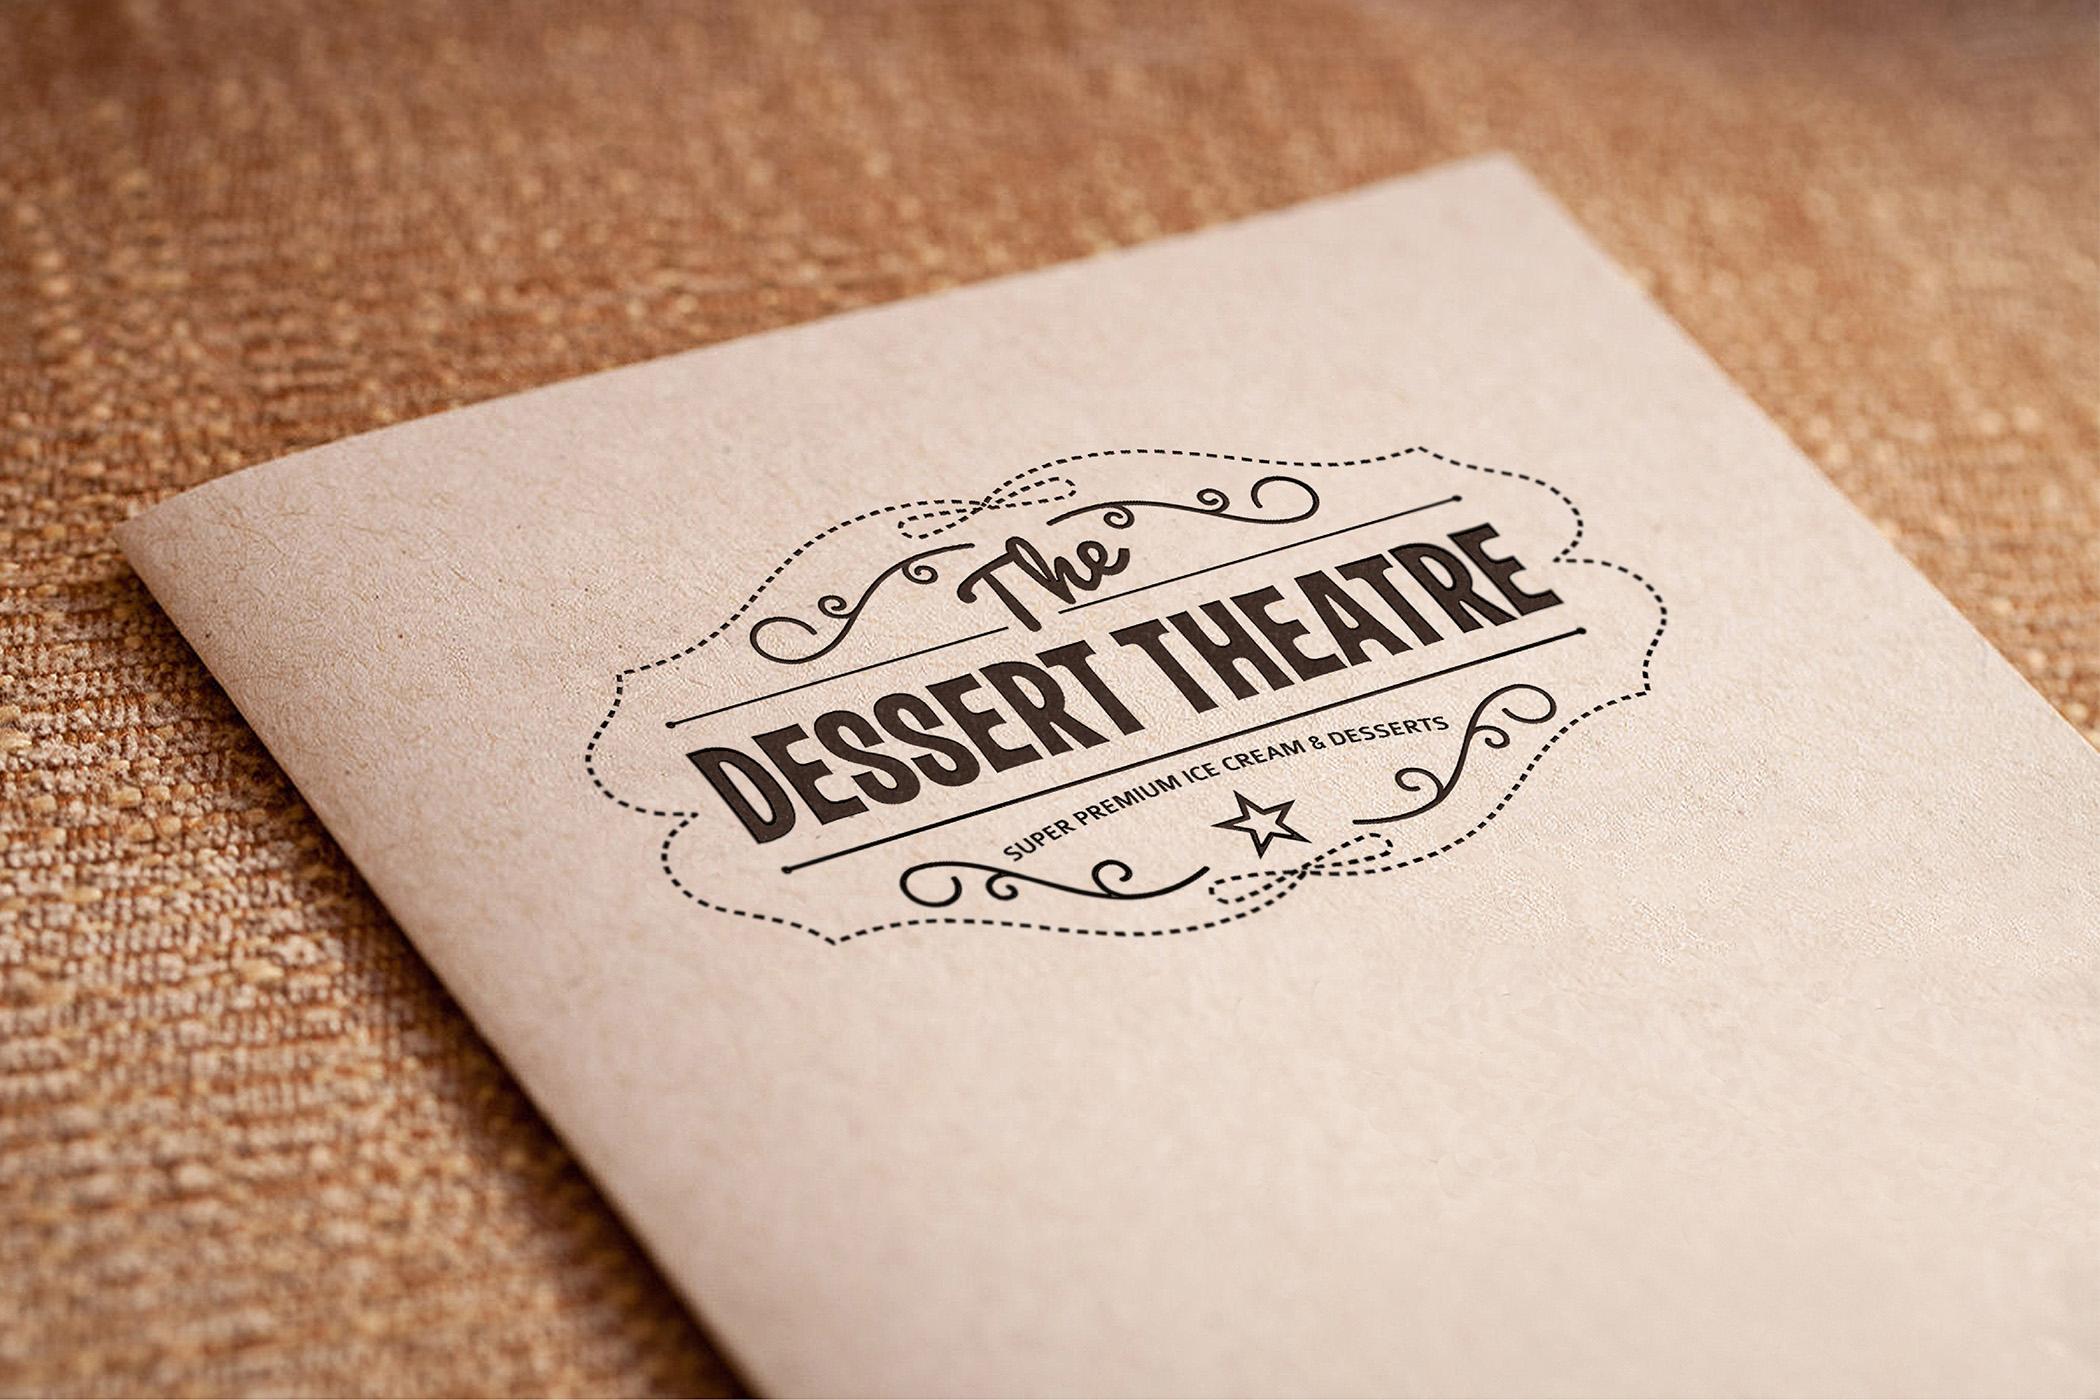 The Dessert Theatre – Concept Branding